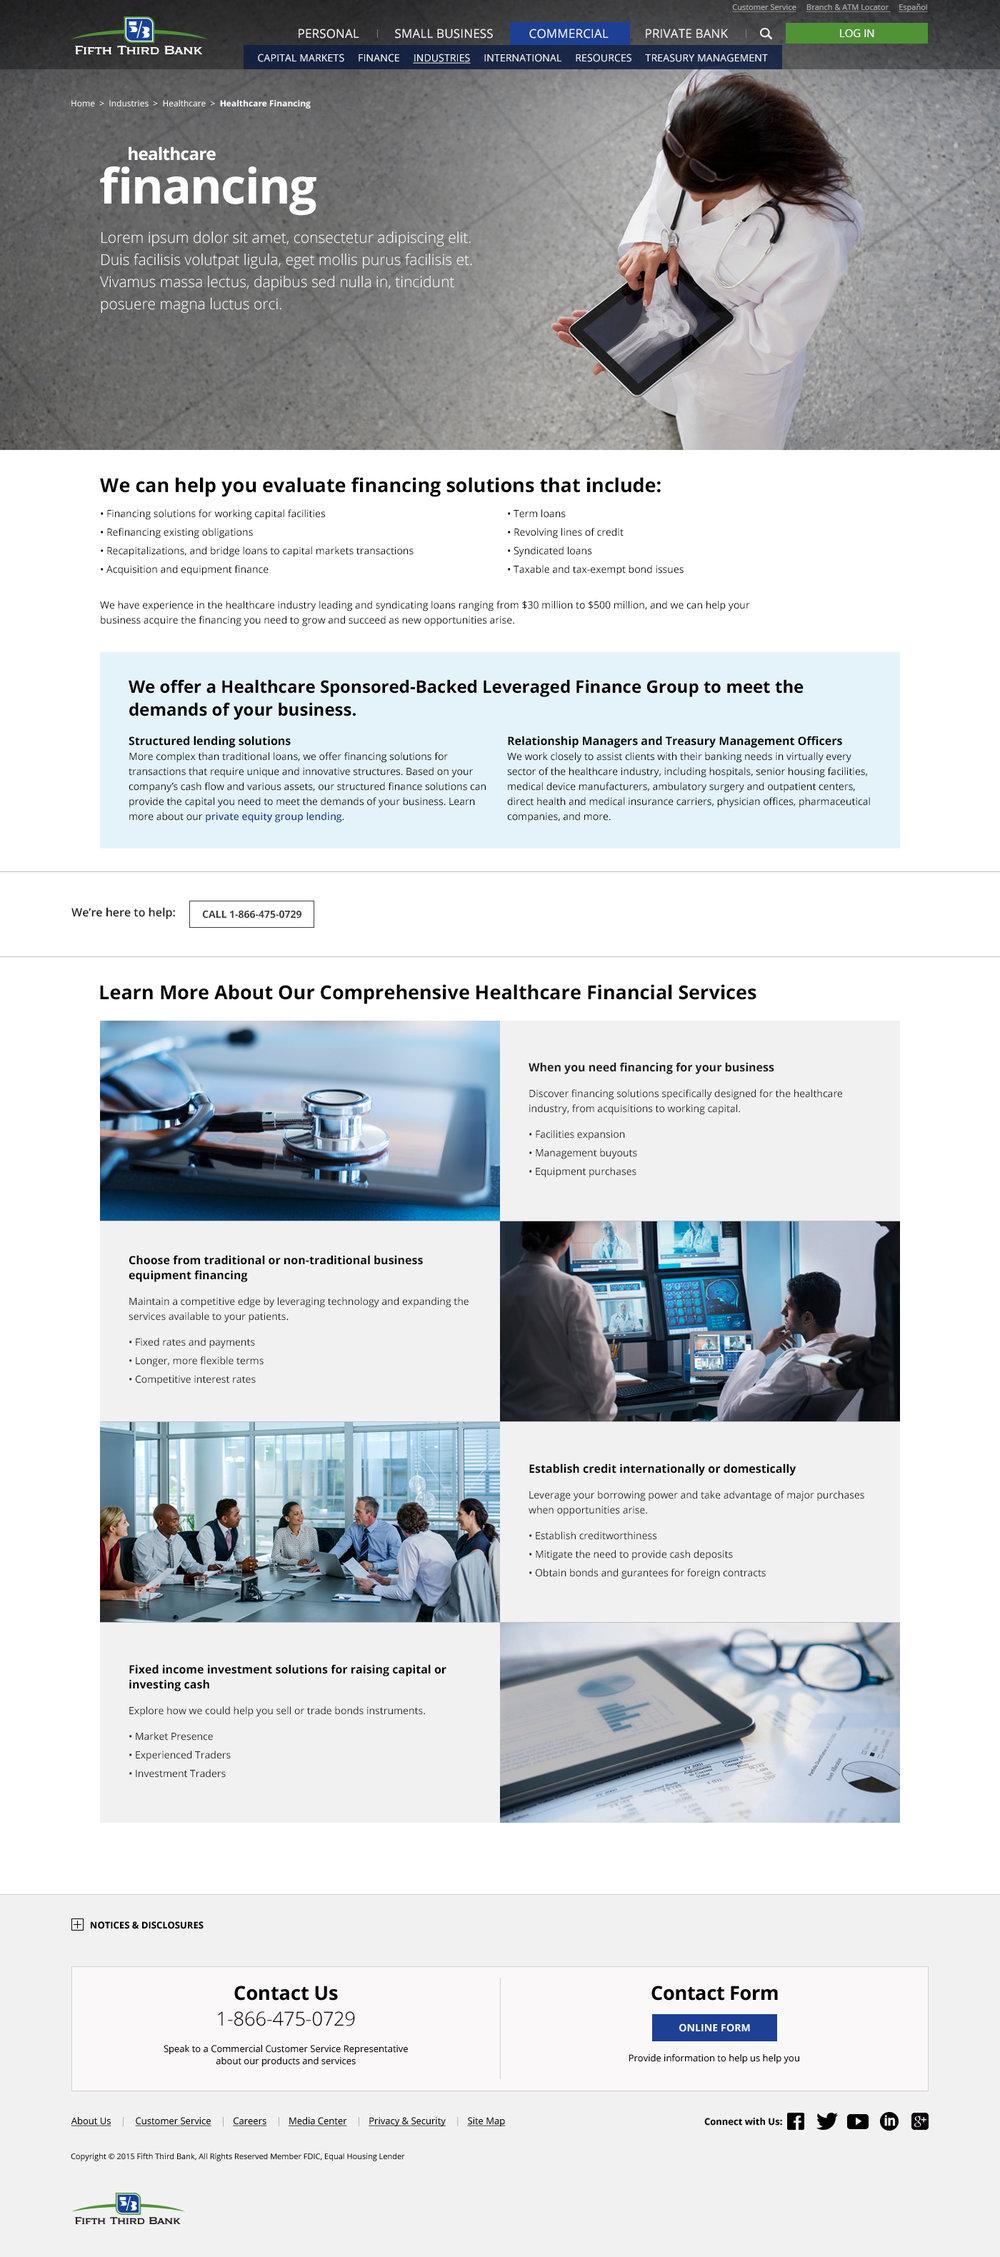 53_Set2_Desktop_4C_Commercial_Expertise_HealthcareFinancing.jpg